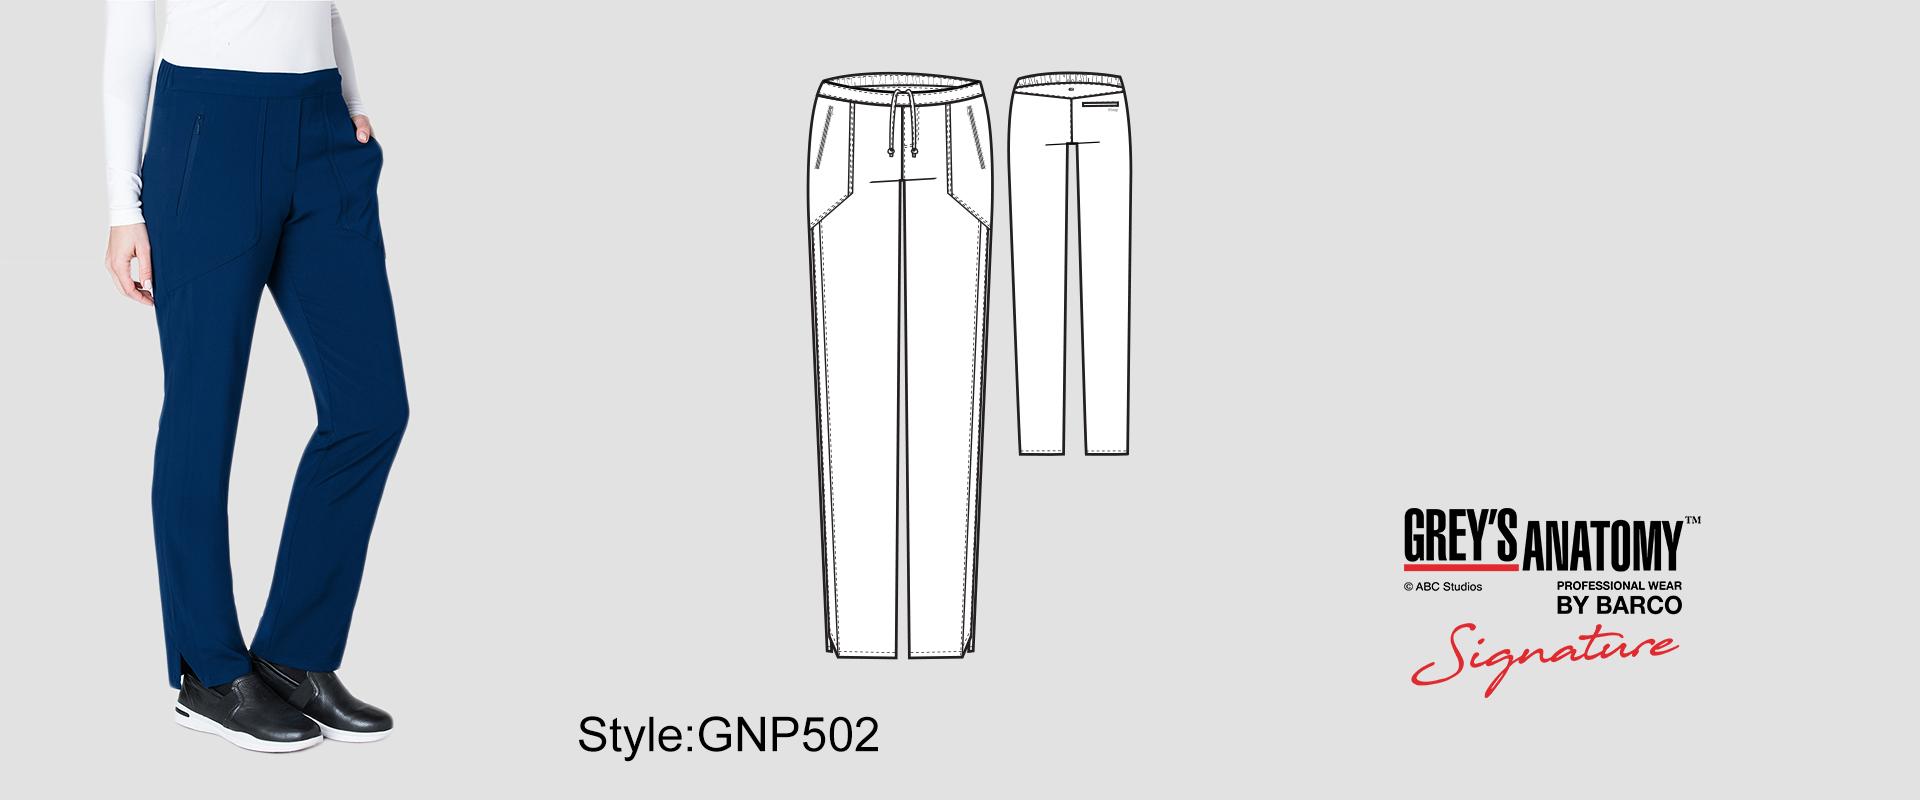 (GNP502) Signature Callie Pant